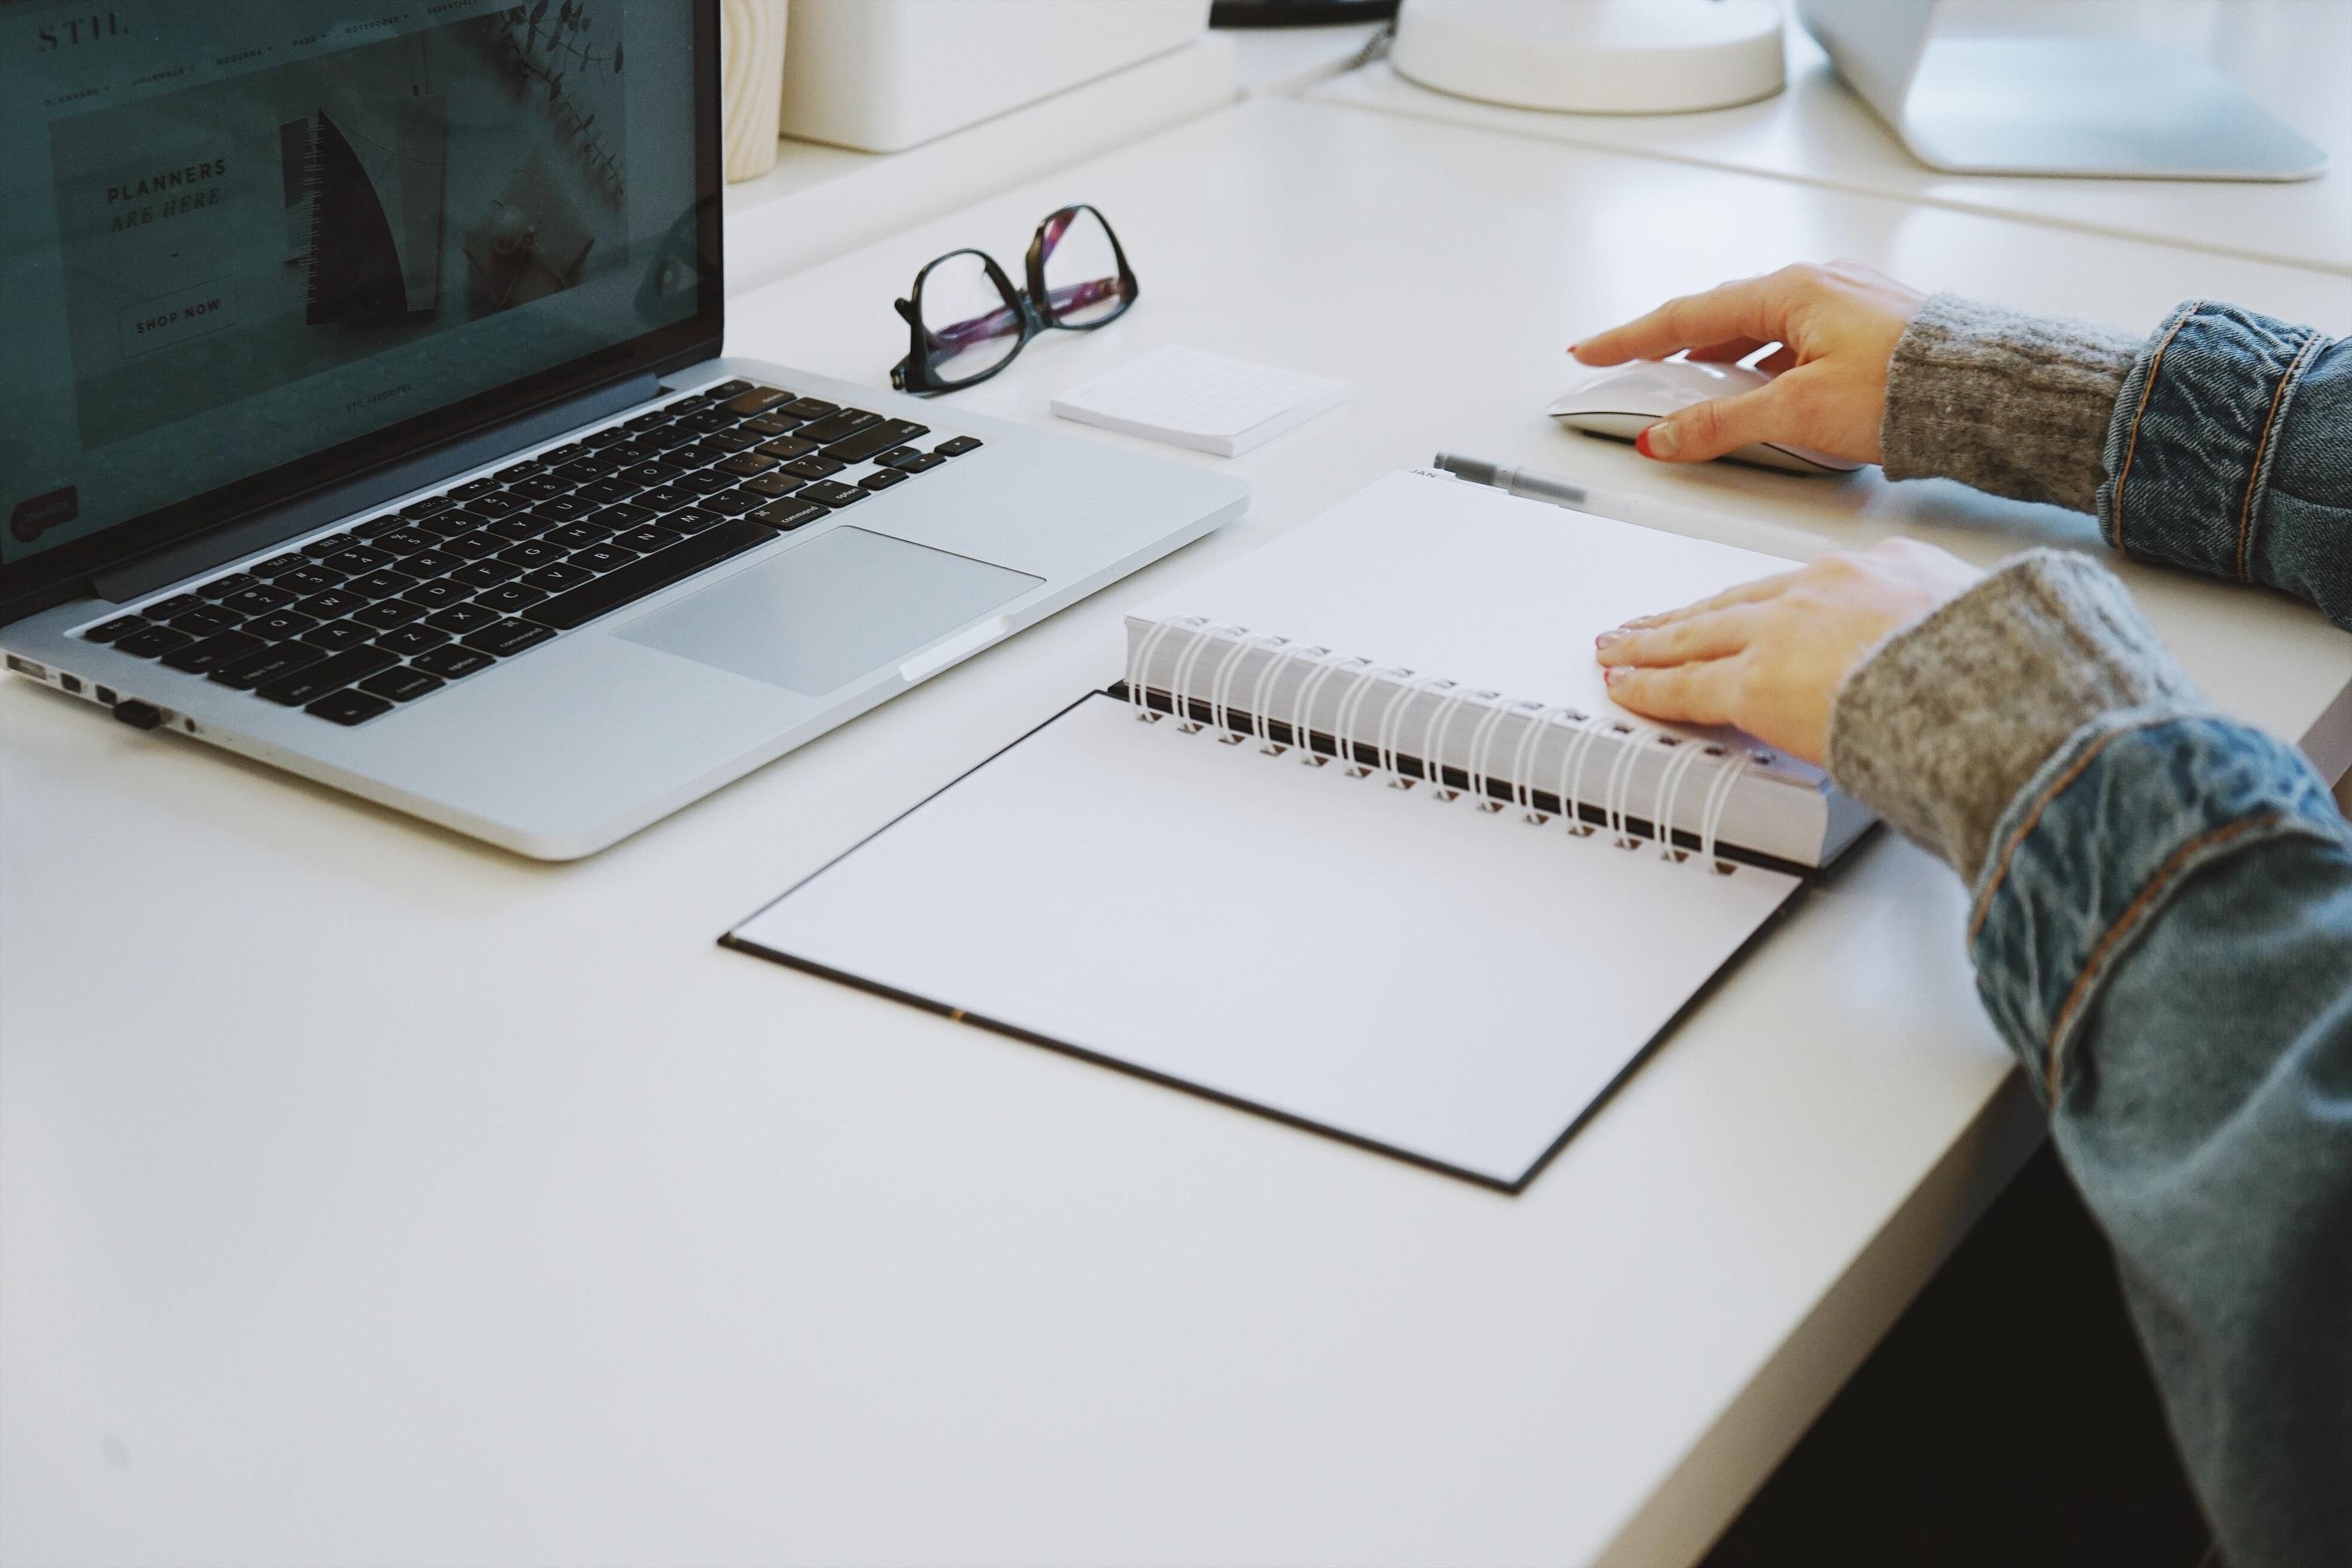 laptop and agenda on desk